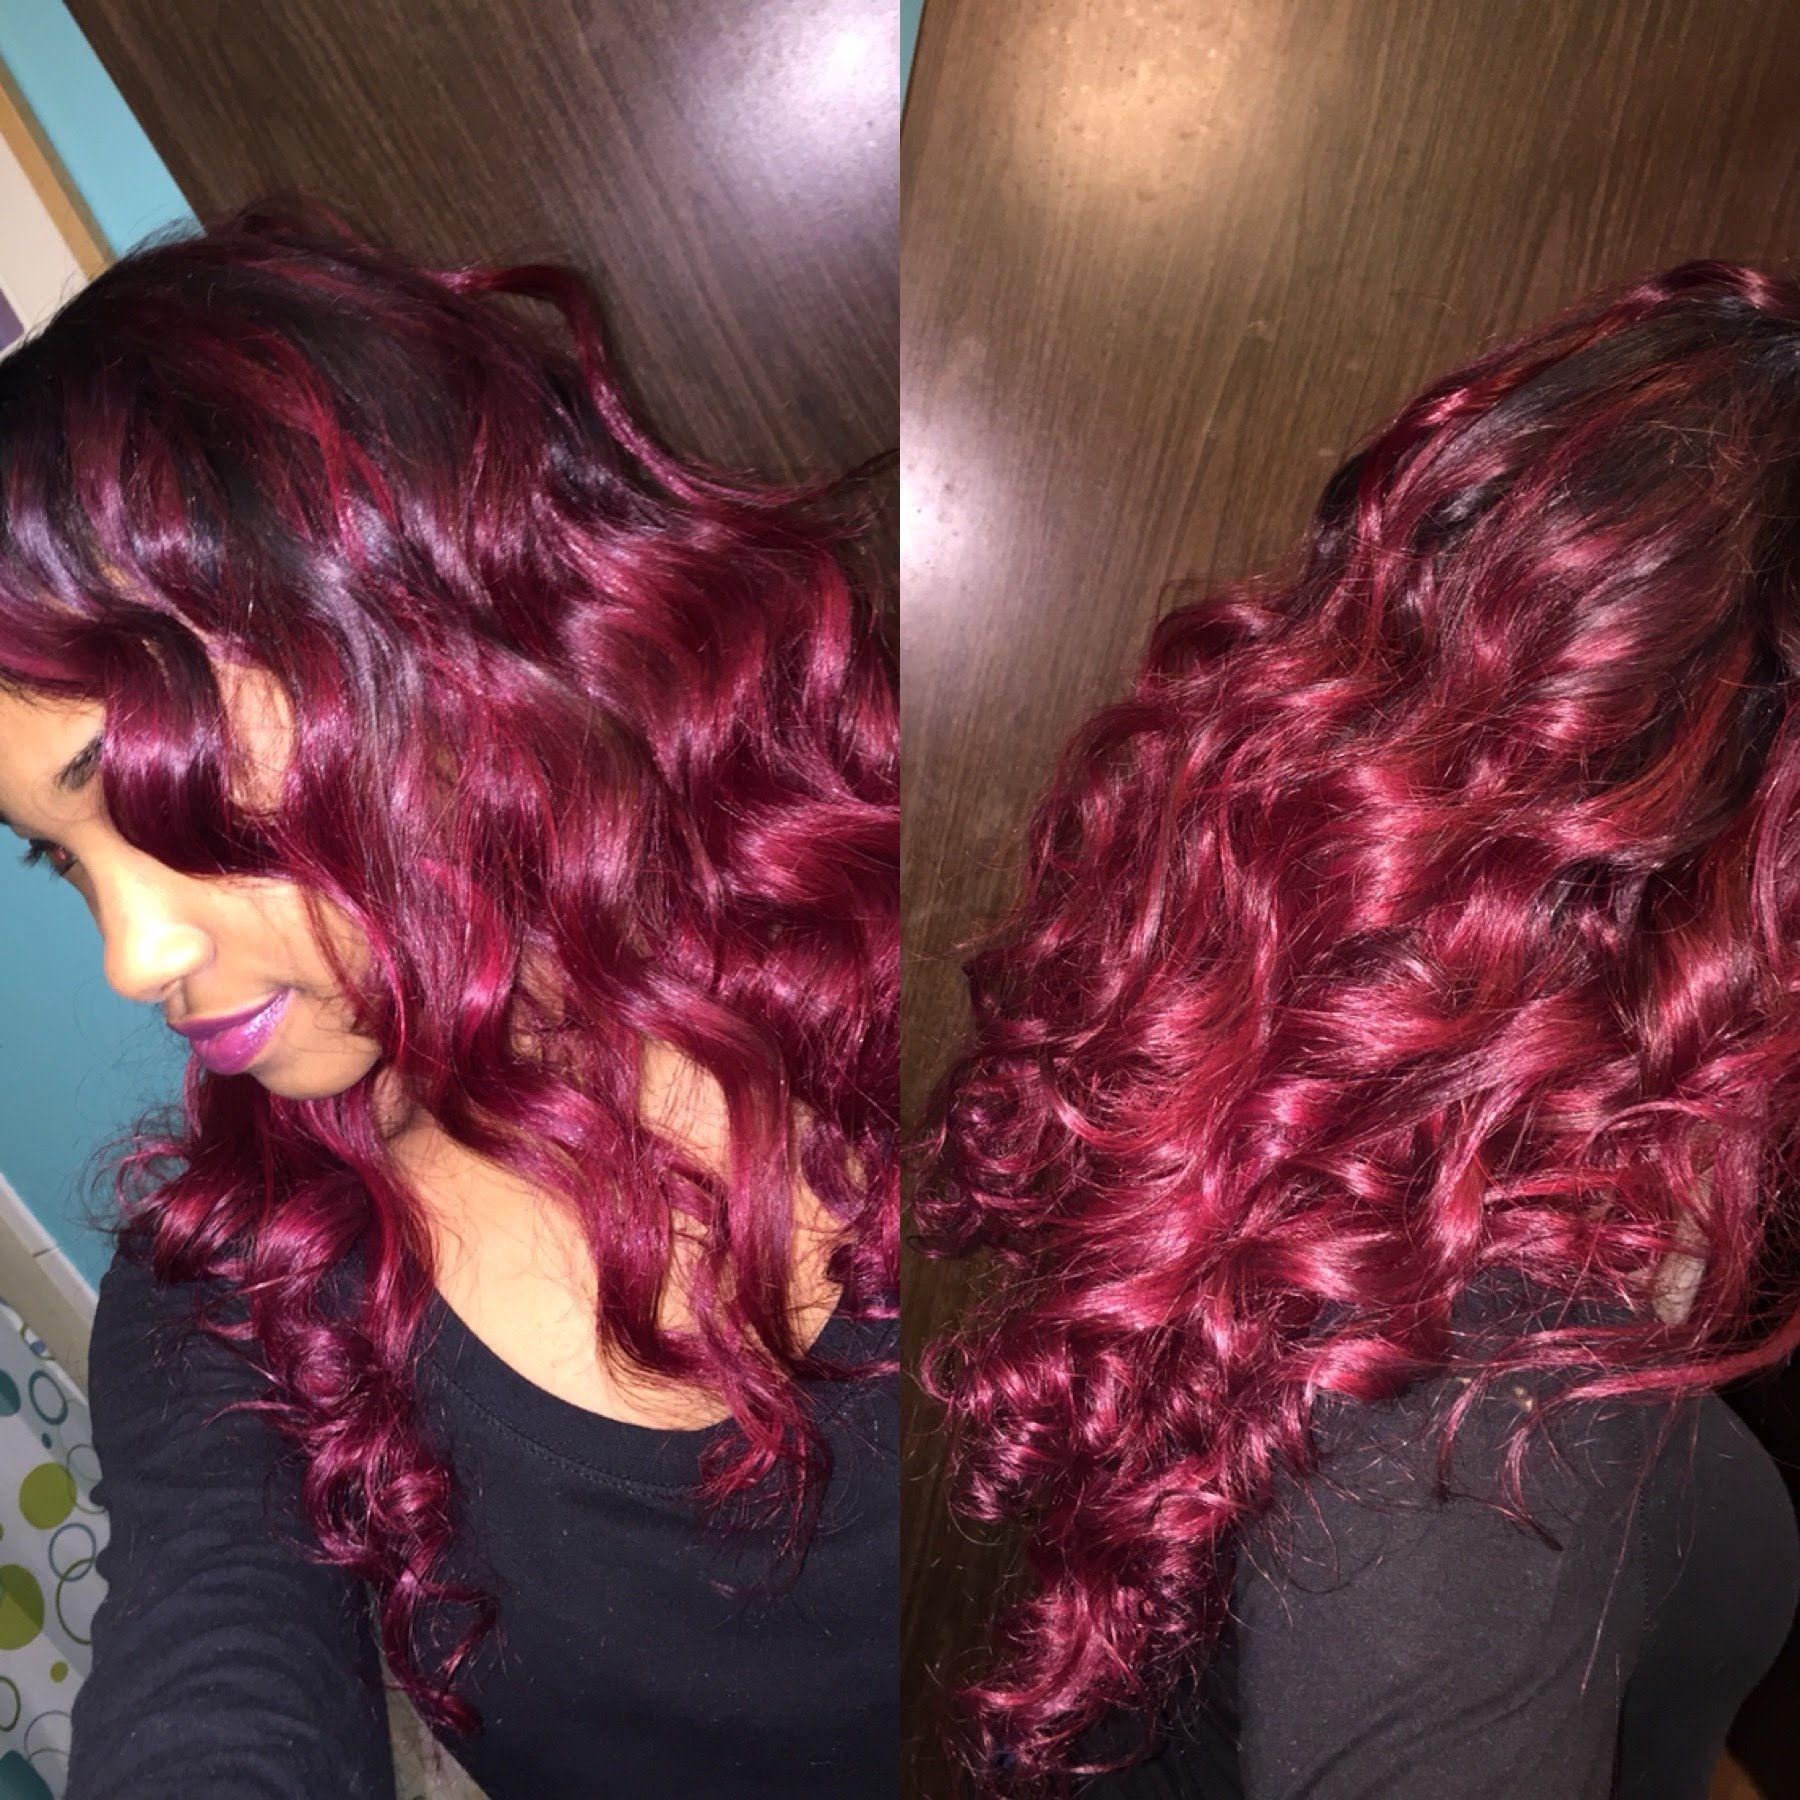 How I Got My Hair Burgundy Red Without Bleach Burgundy Hair